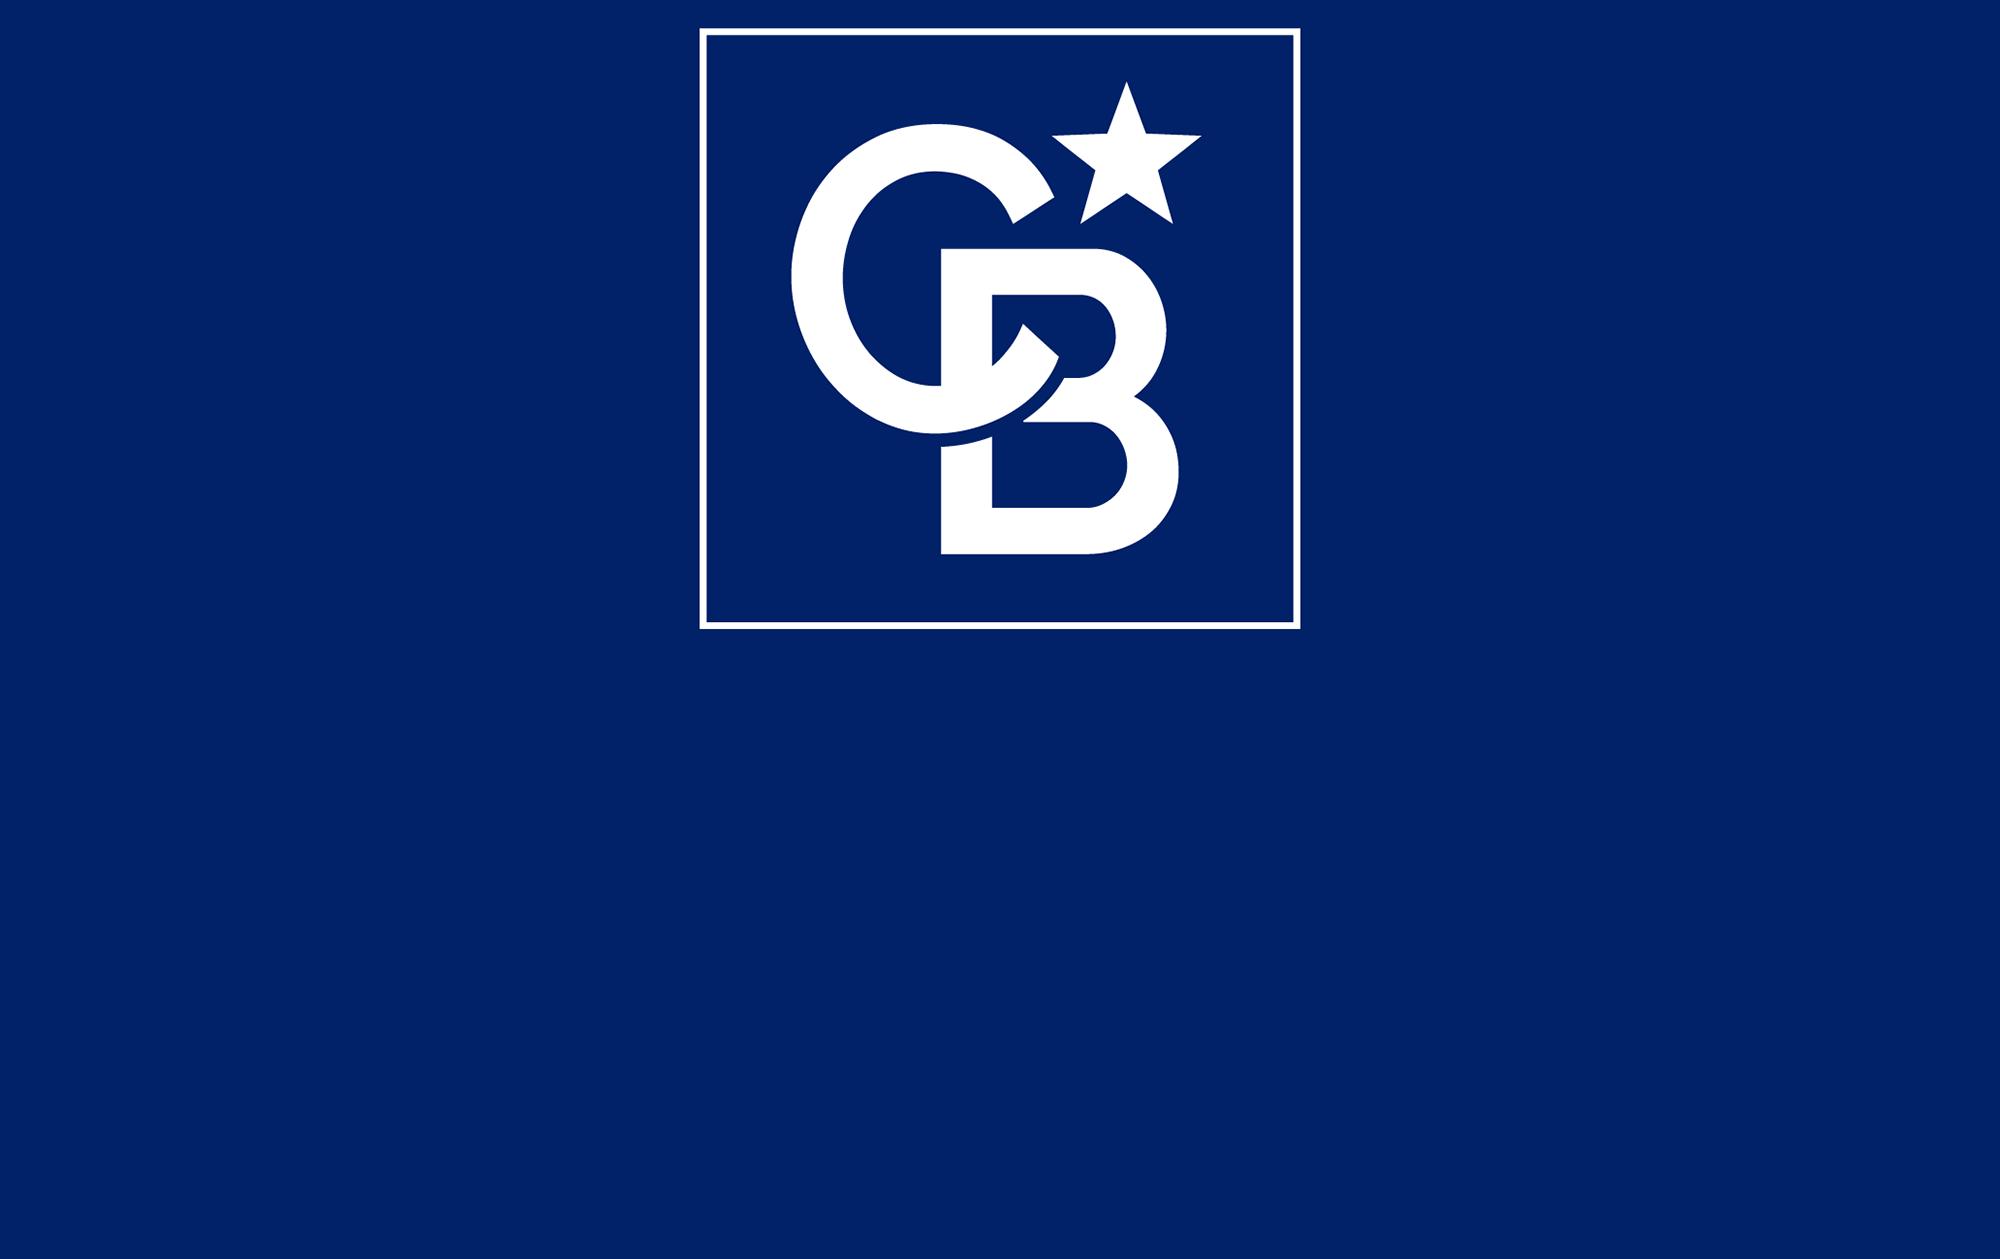 Michael Sprague - Coldwell Banker Hubbell BriarWood Logo